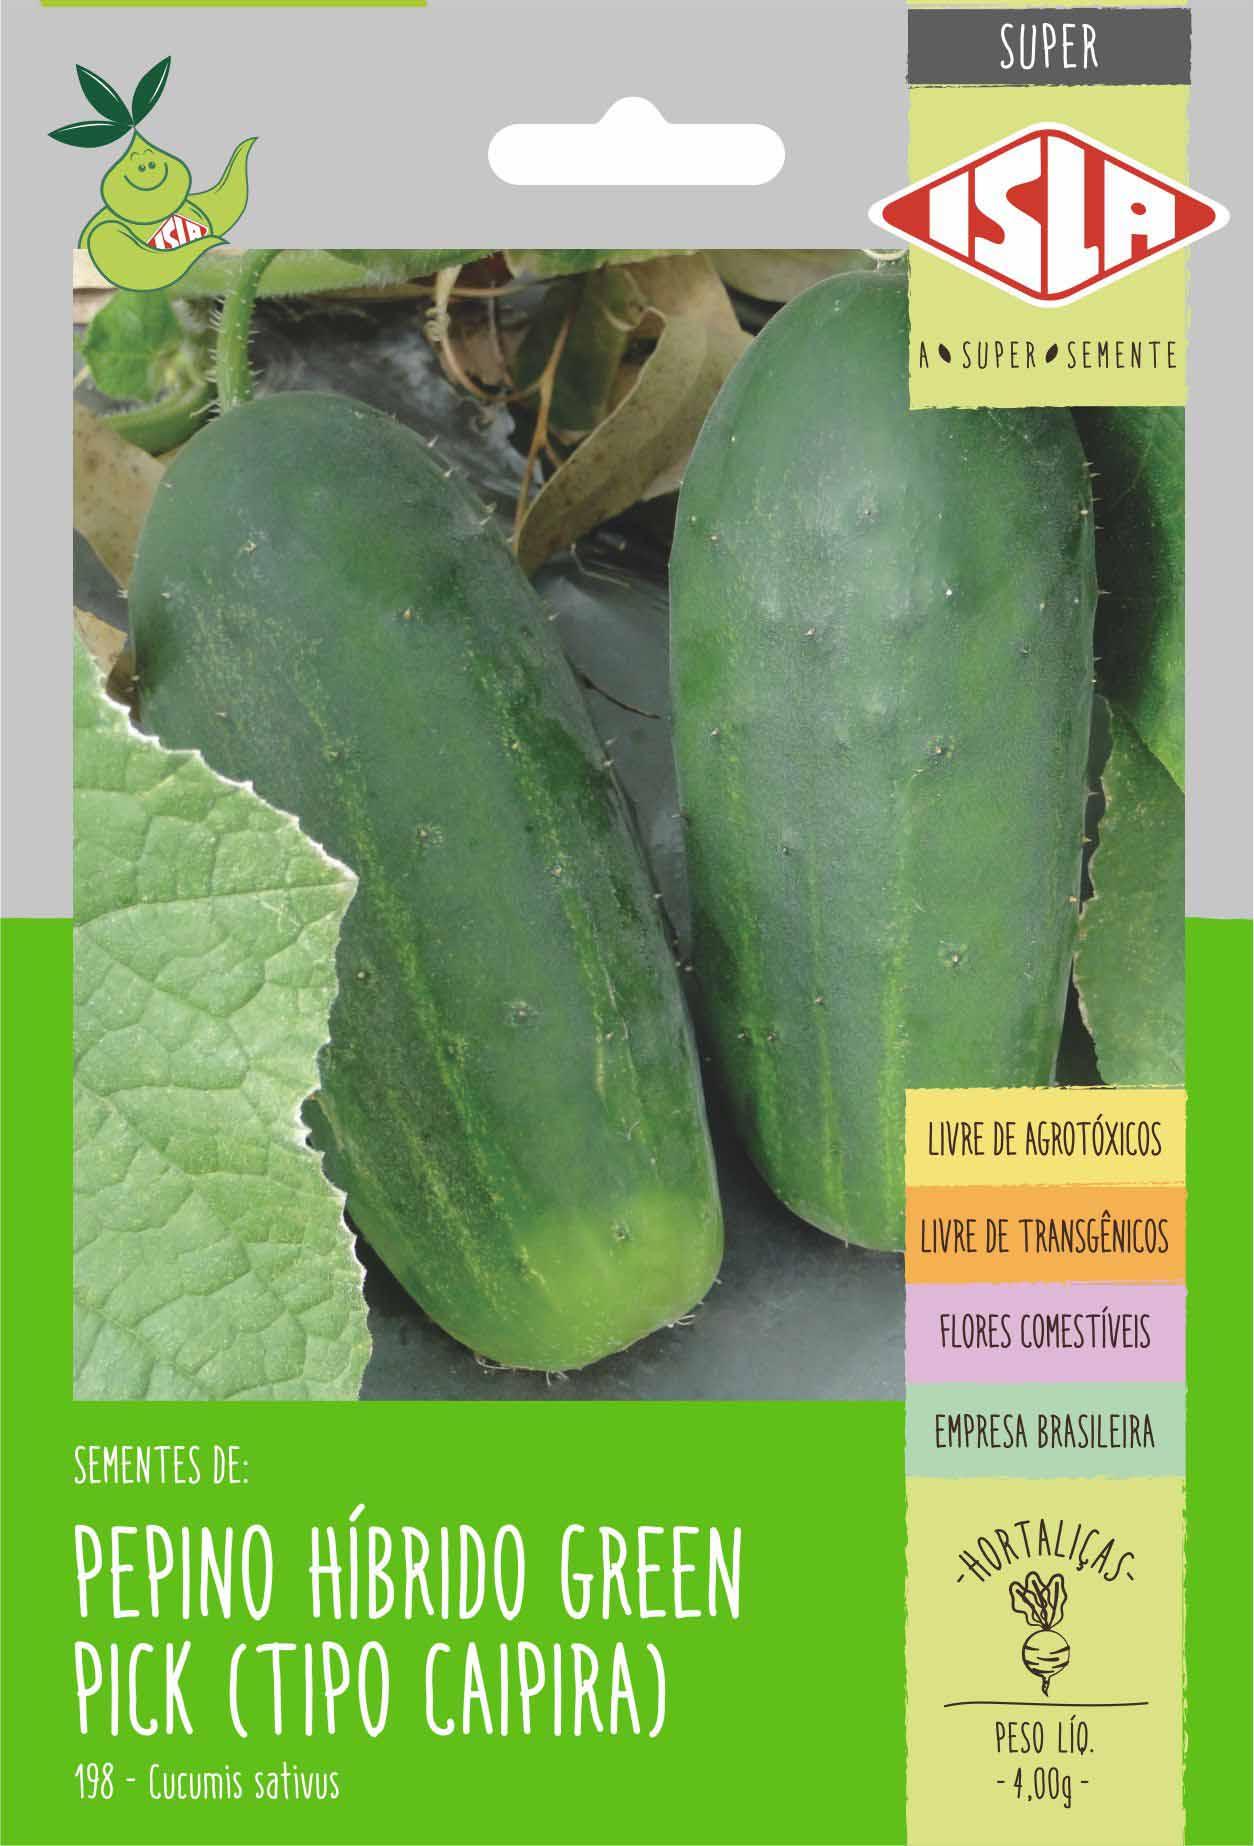 Sementes de Pepino Híbrido Green Pick (tipo caipira) - Isla Superpak